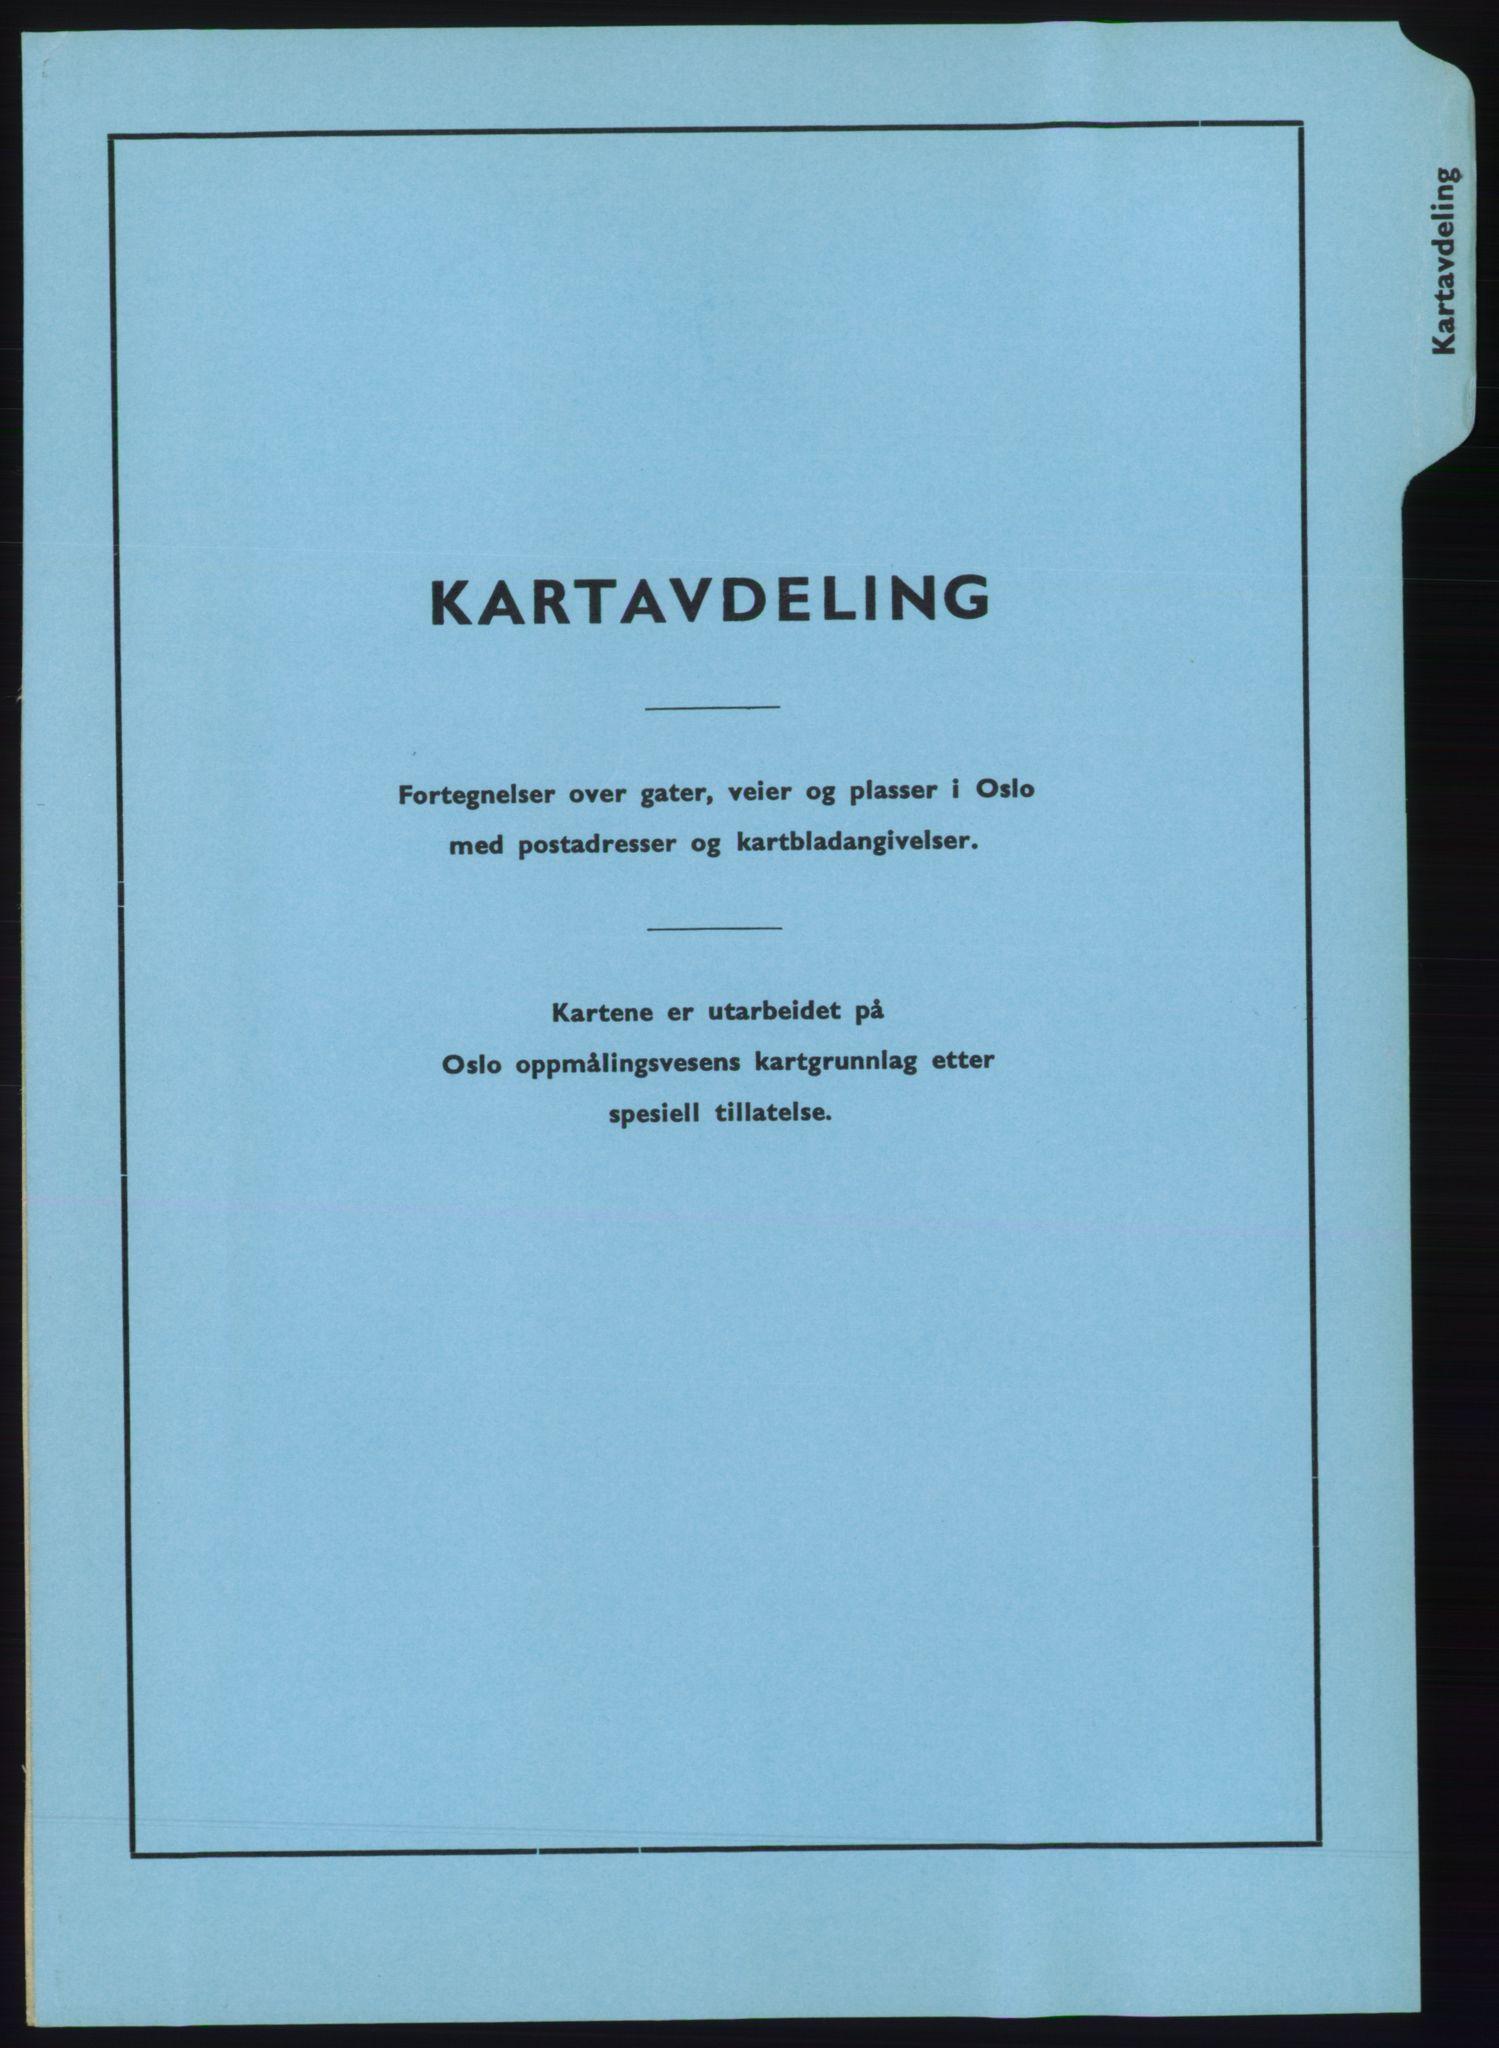 PUBL, Kristiania/Oslo adressebok, 1970-1971